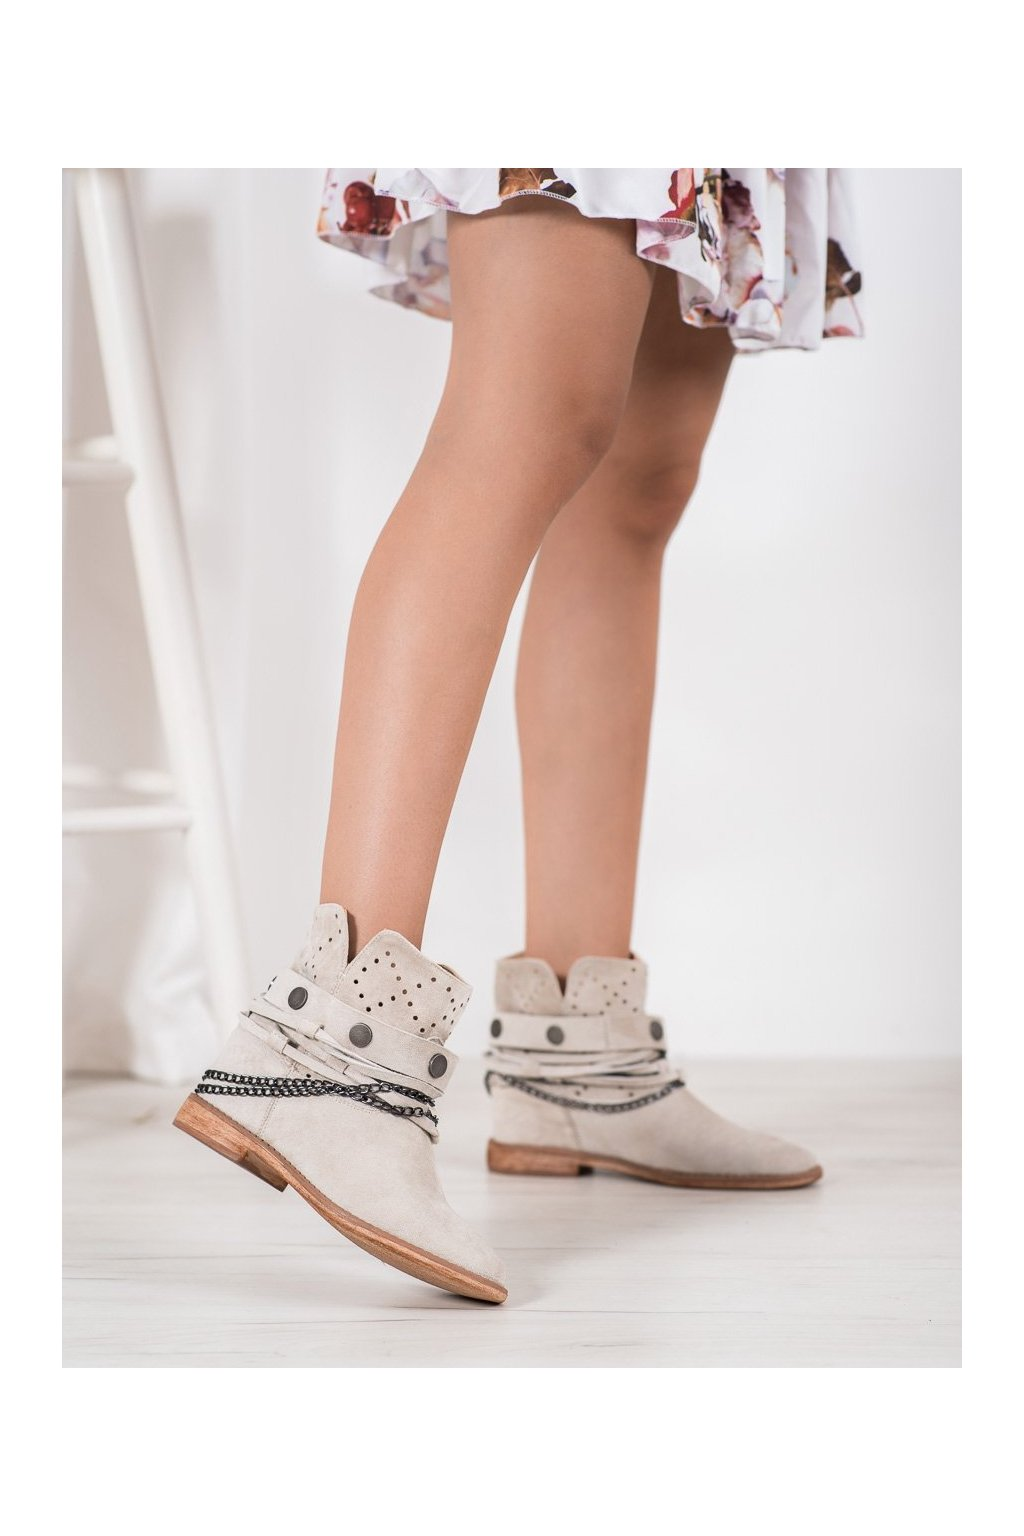 Hnedé dámske topánky Bella paris kod A3731L.BE